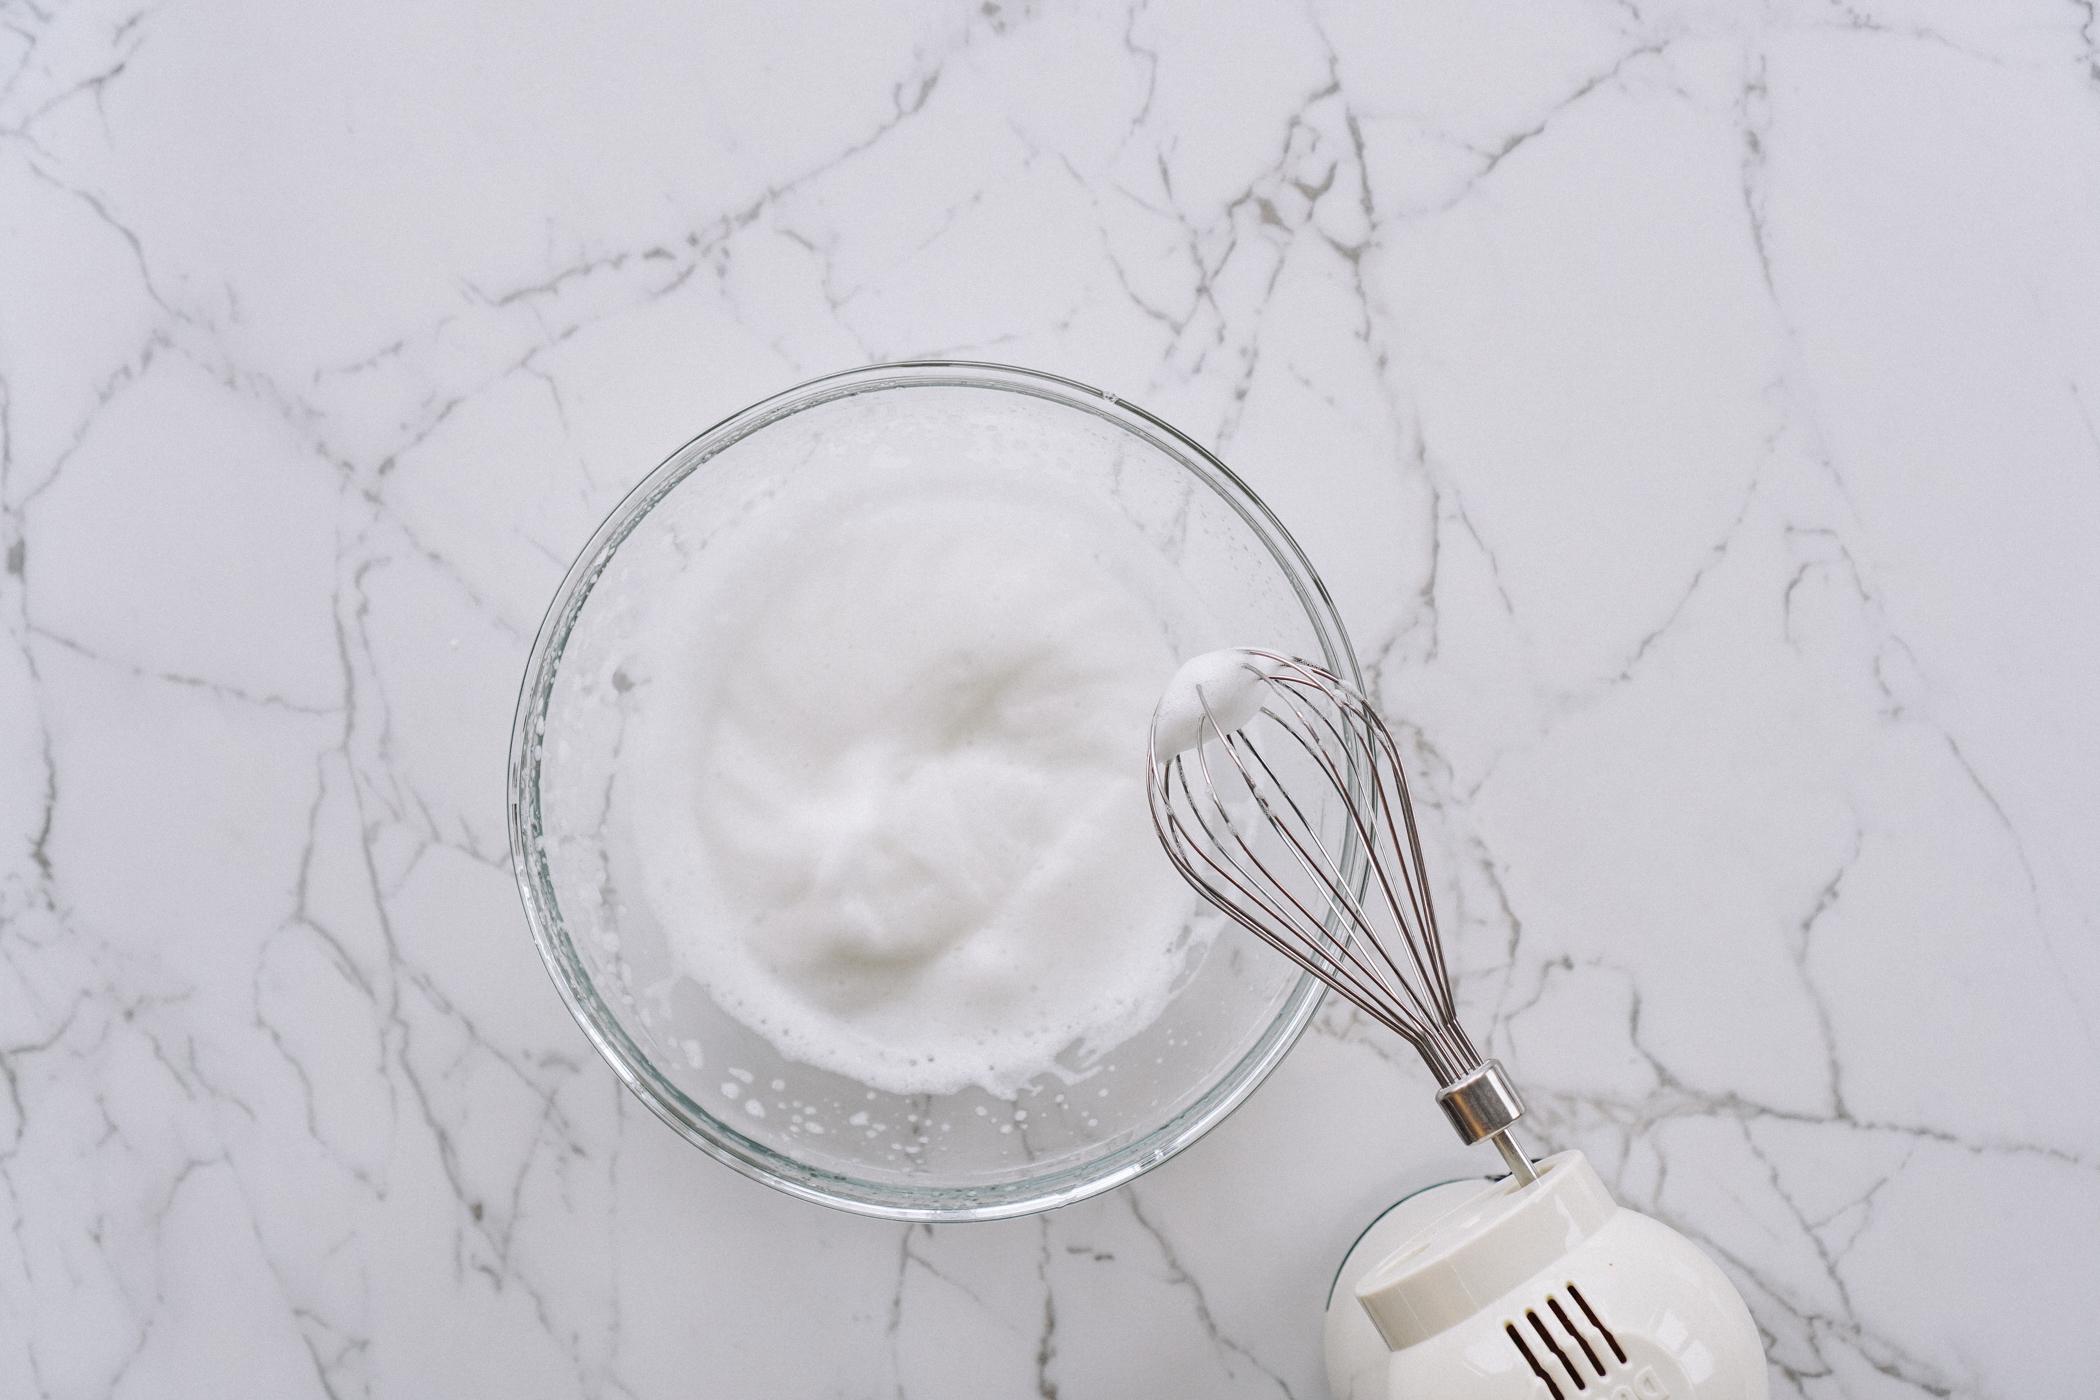 vegan_citrus_pavlova_with_coconut_cream_and_thyme-26.jpg